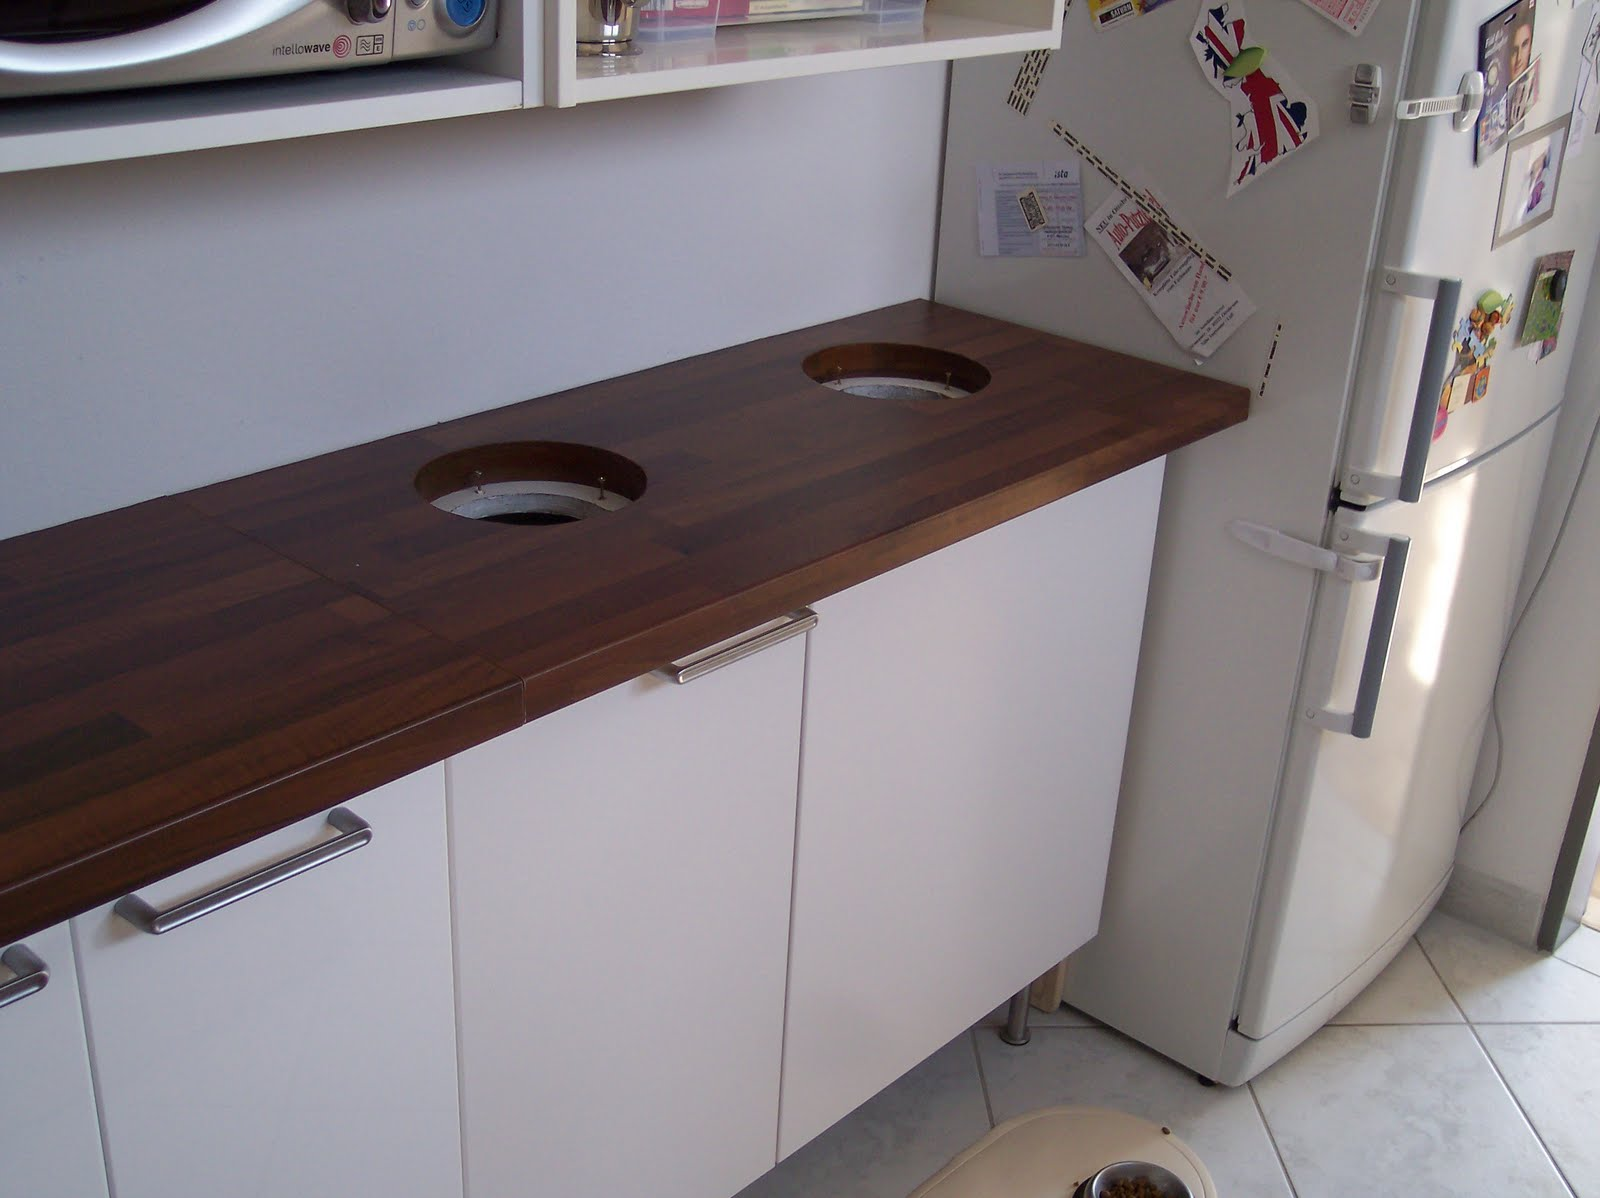 Recycling Bin Solution